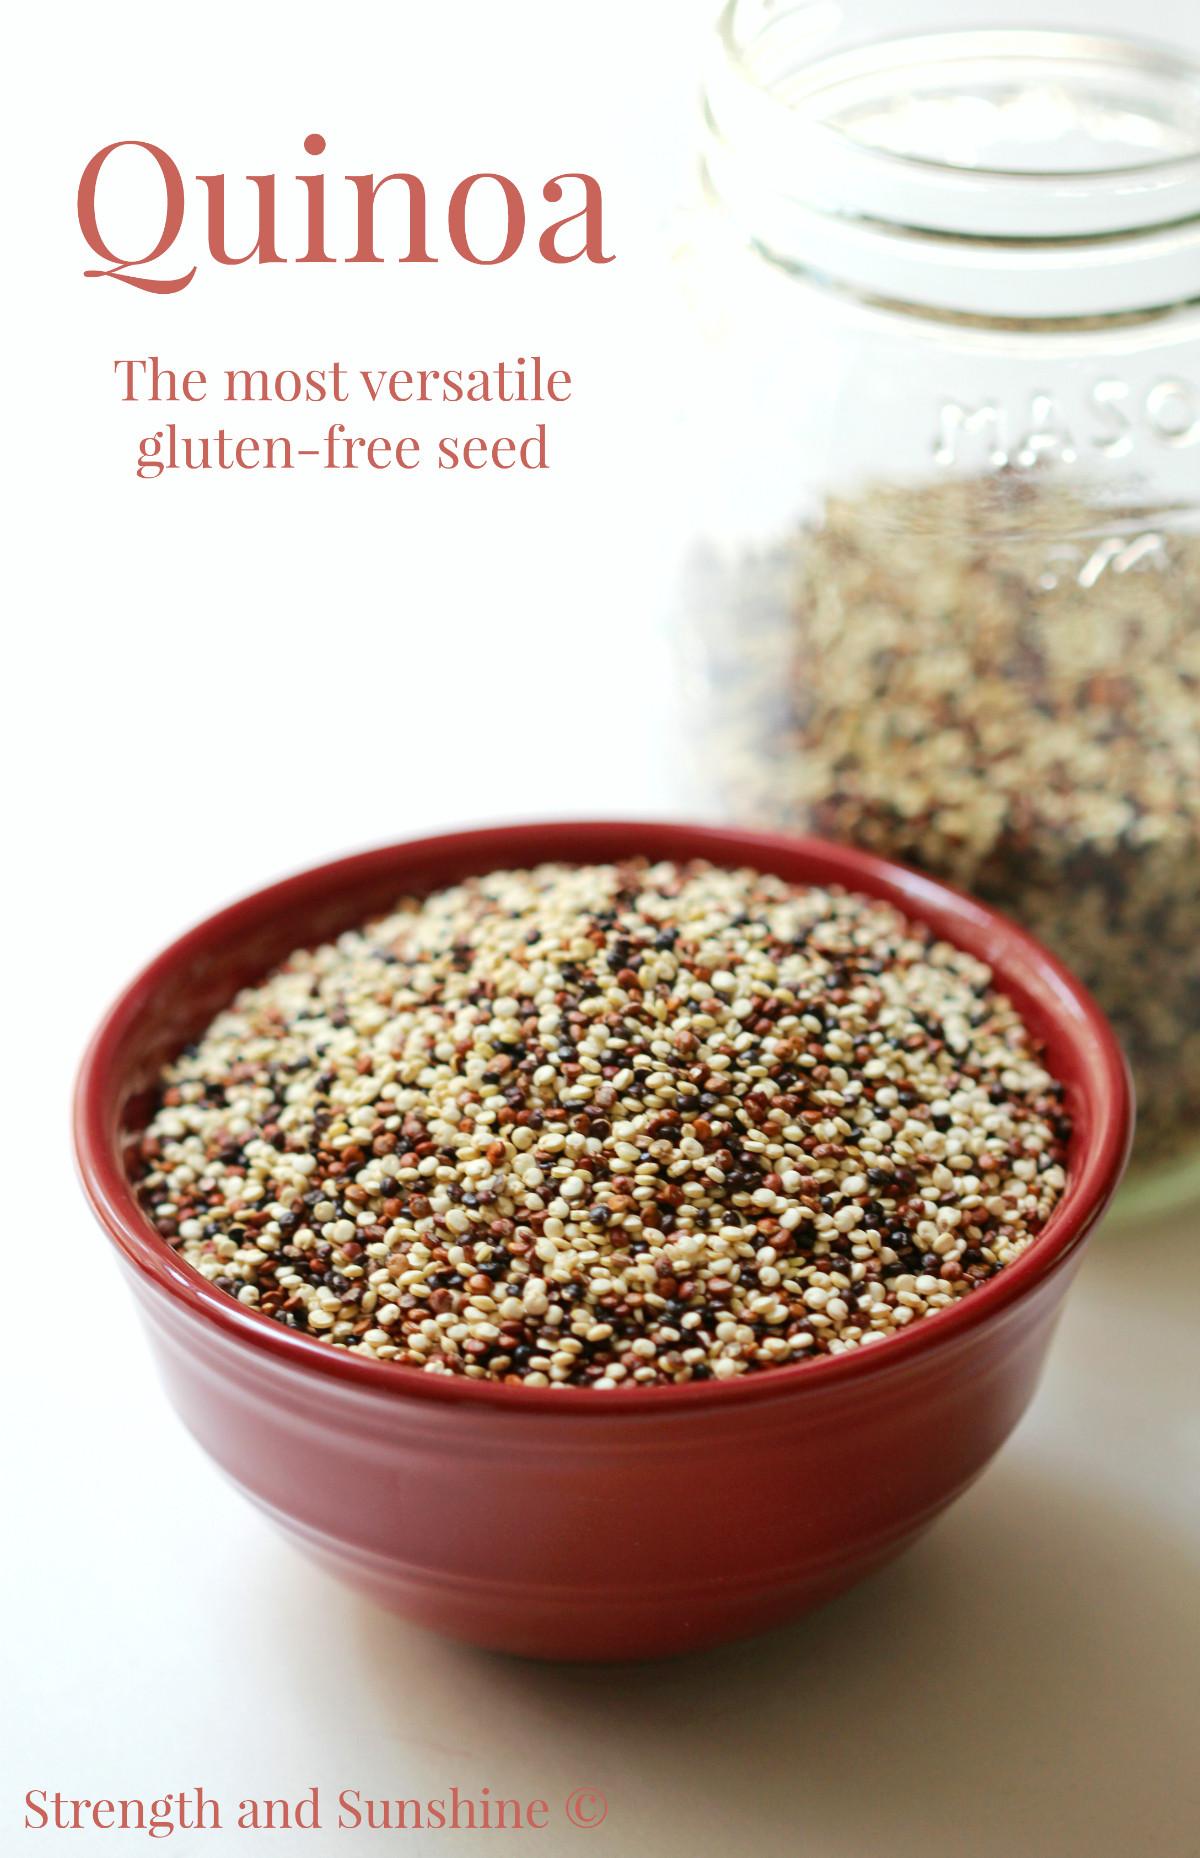 Is Quinoa Gluten Free  Quinoa The Most Versatile Gluten Free Seed